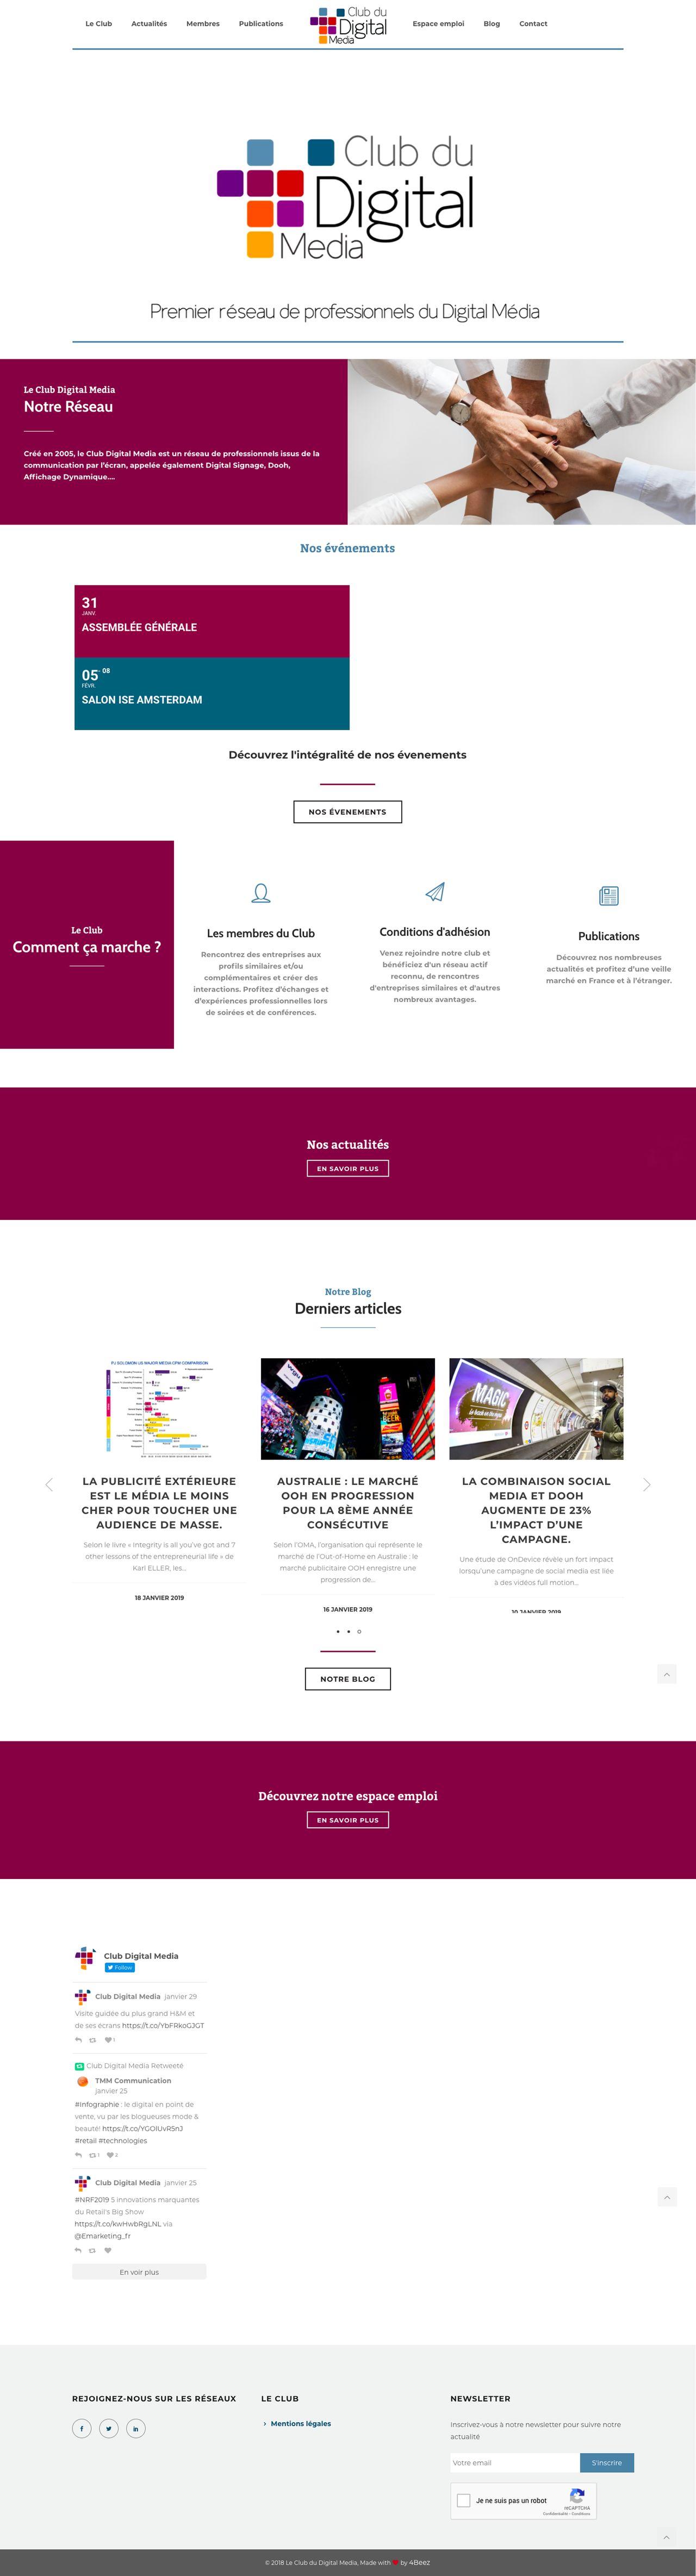 Création du site institutionnel Club digital media